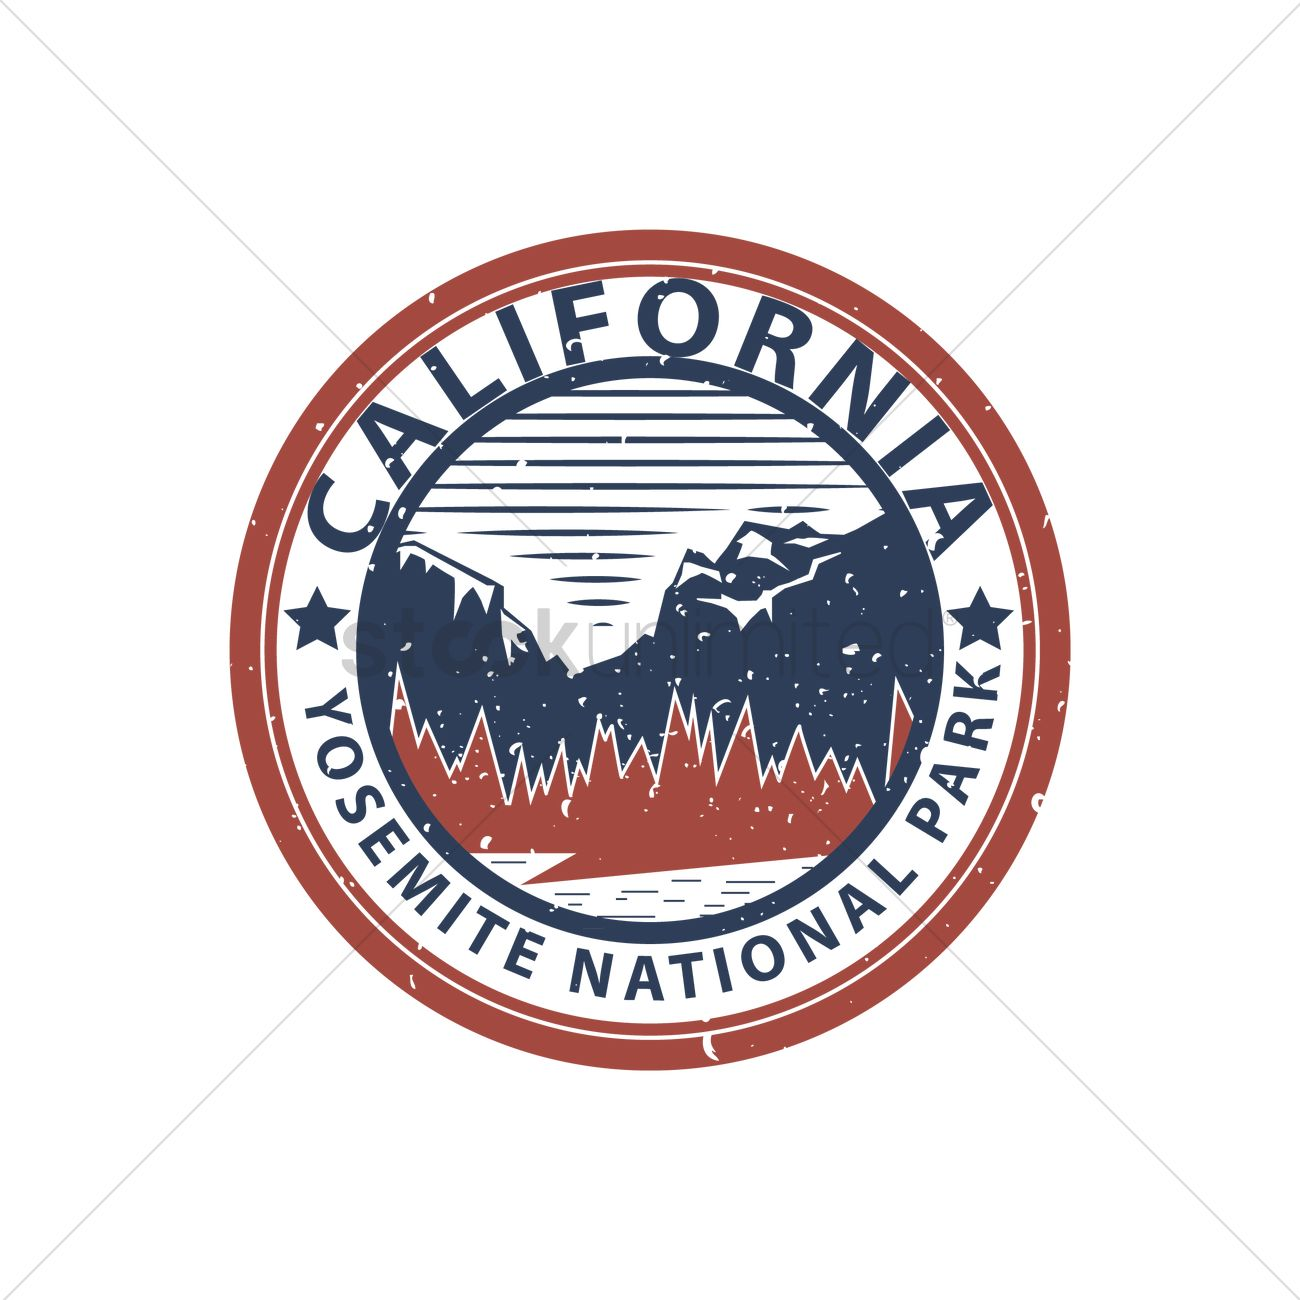 Yosemite national park Vector Image.